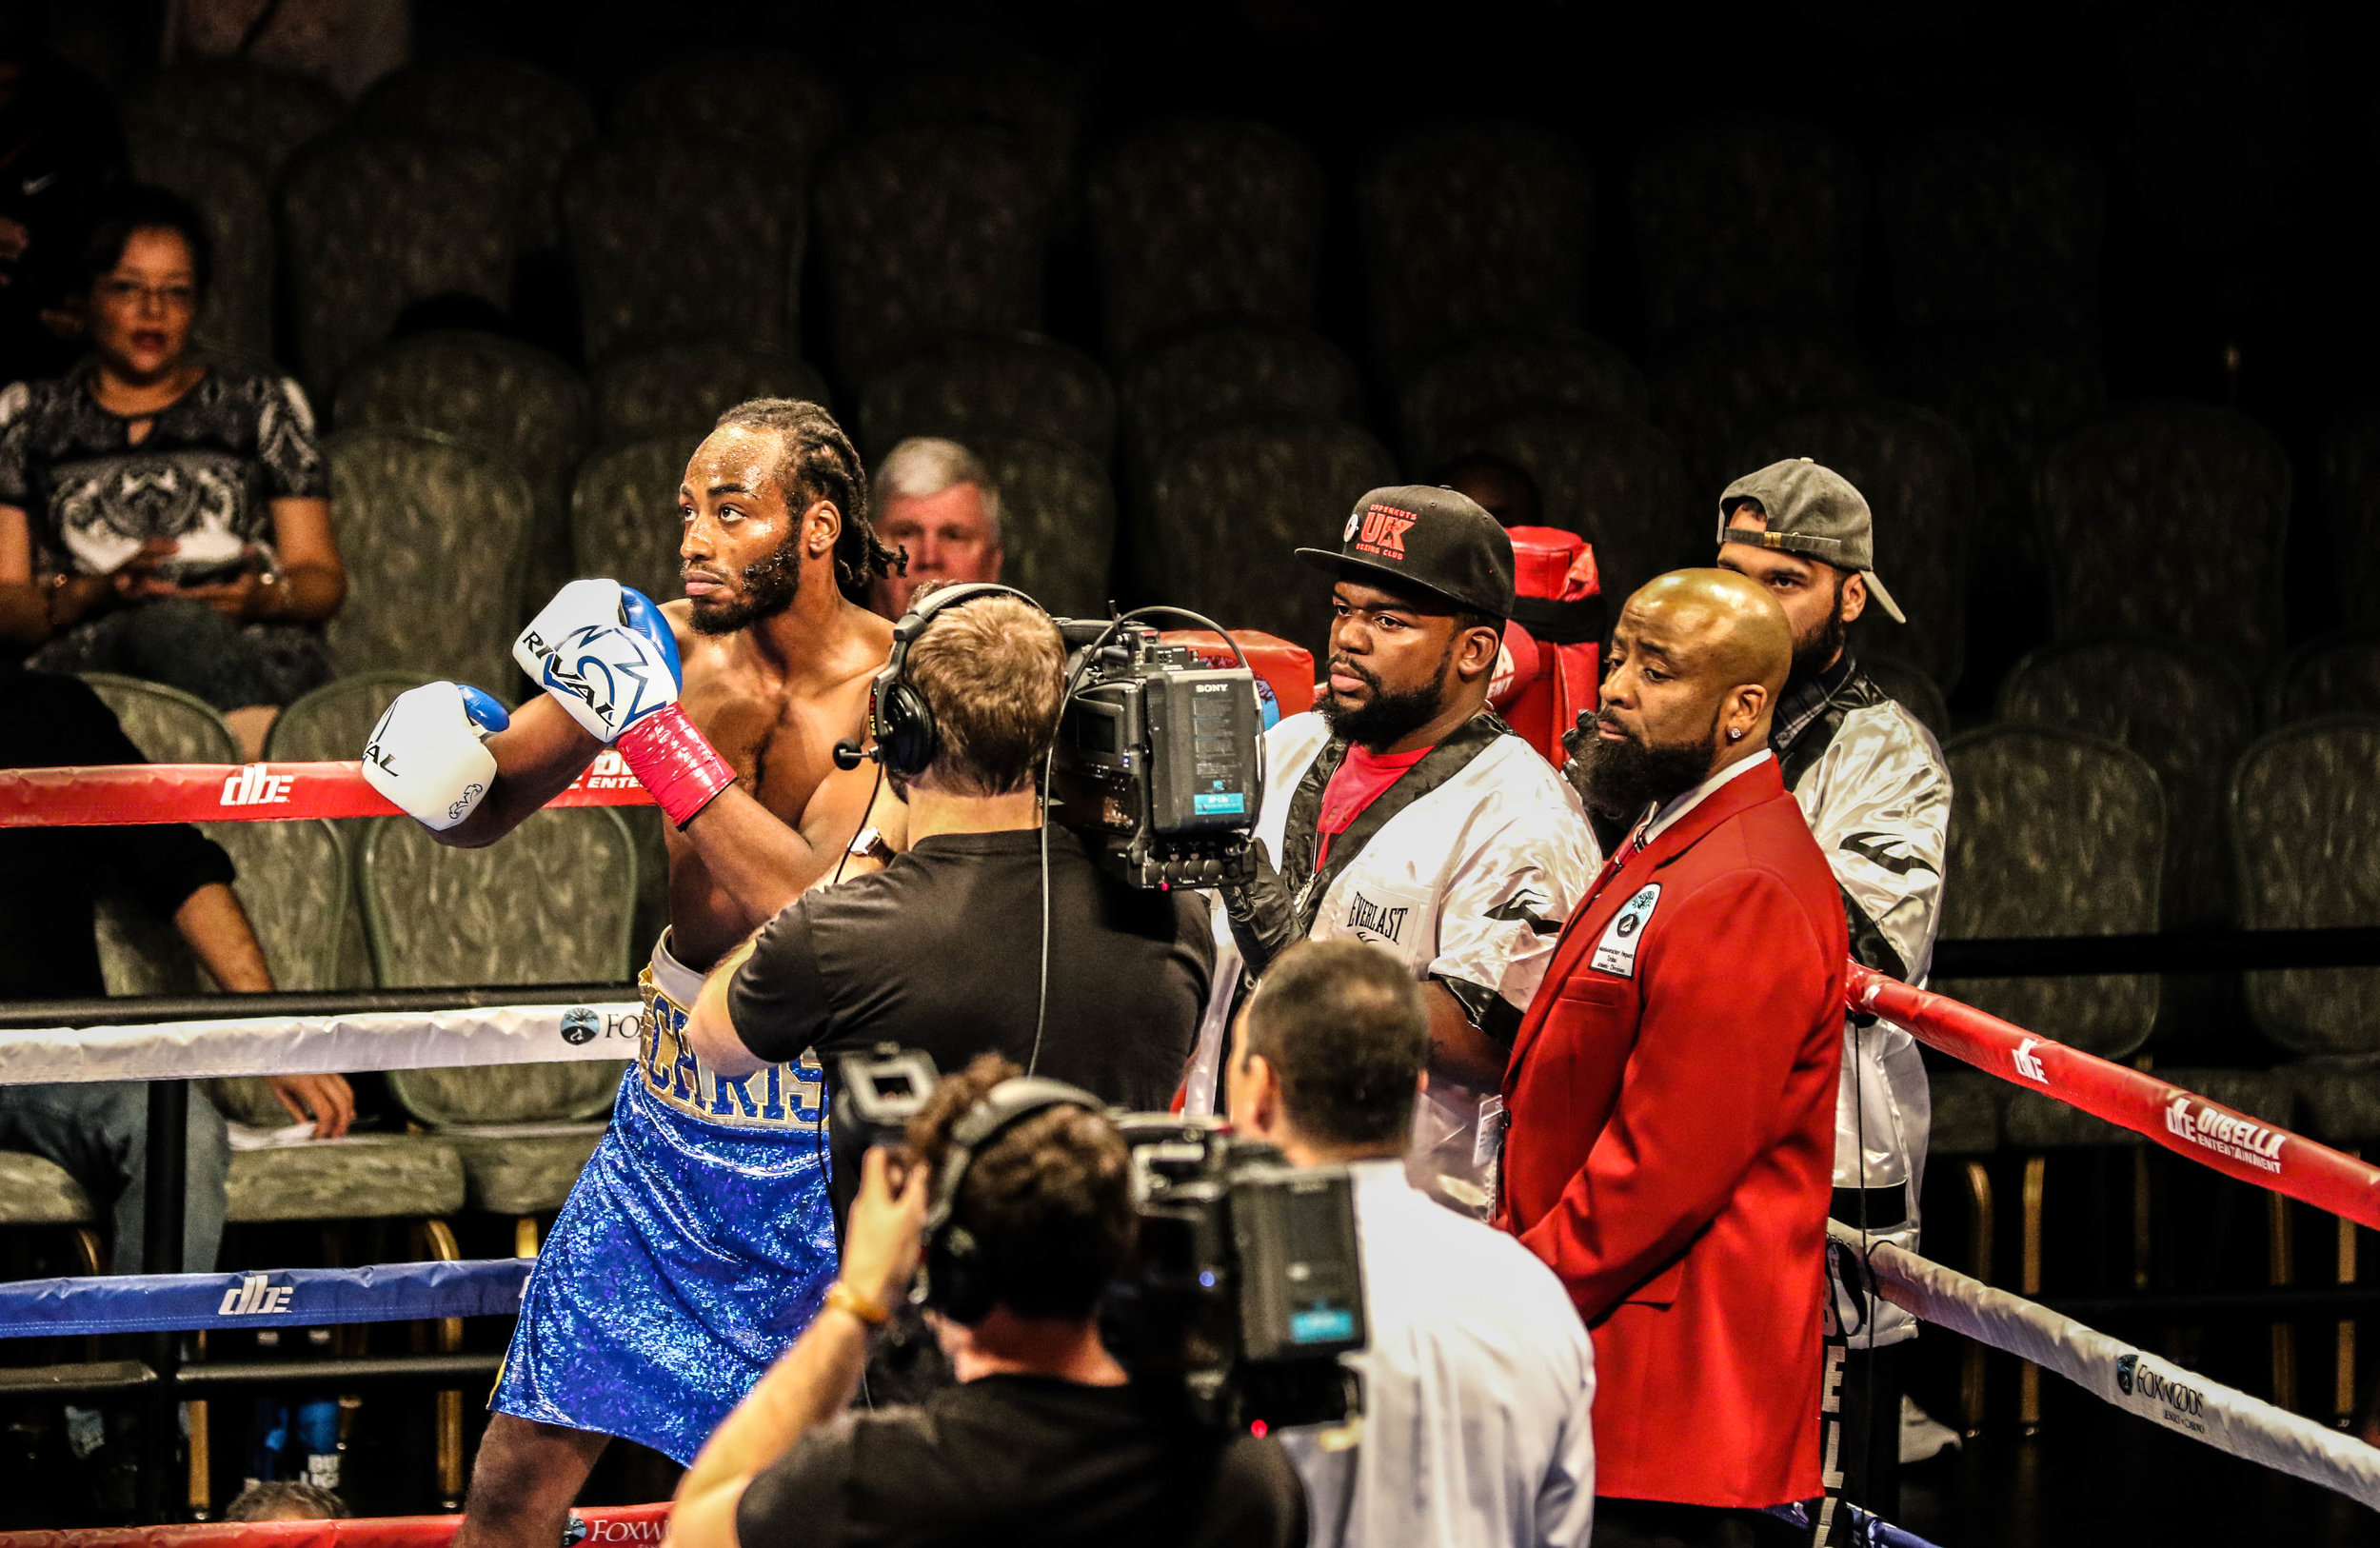 UpperKuts Boxing Club Christopher Davis-Fogg